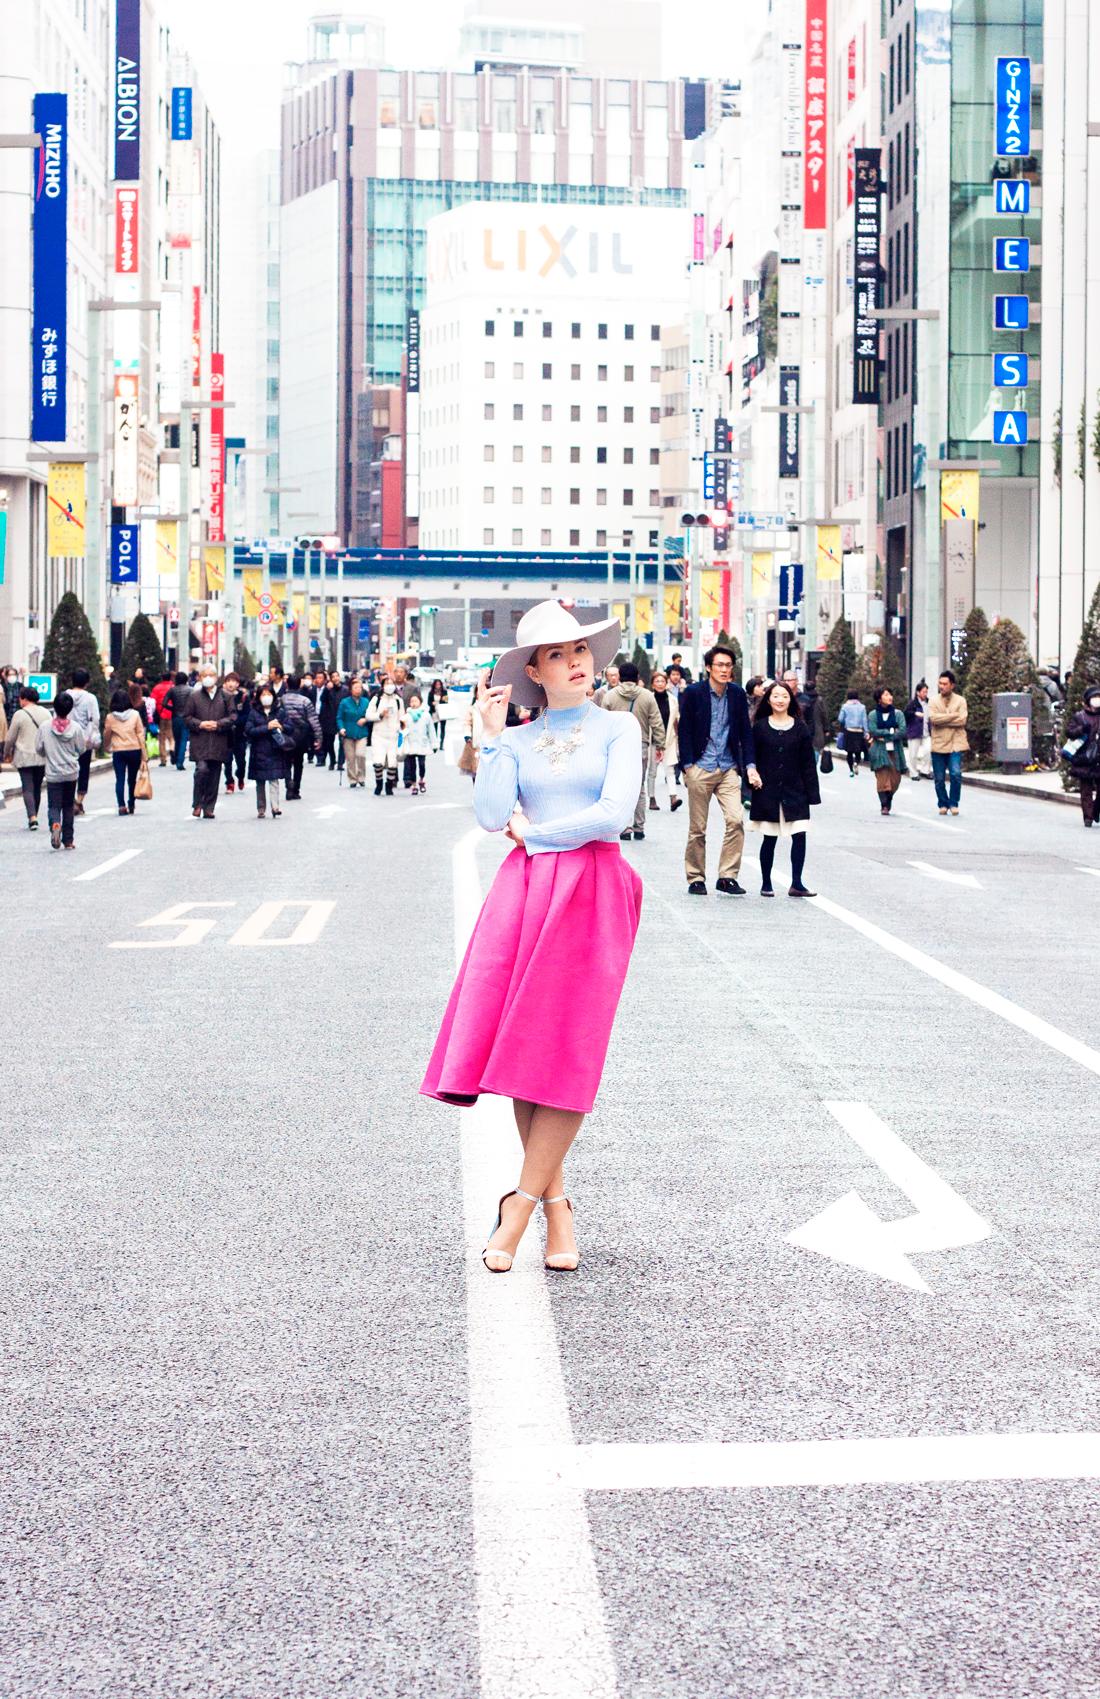 chuo-dori, ginza, tokyo, japan, cherryblossomstreet, fedora, stateent jewelry, pink skirt, baby blue